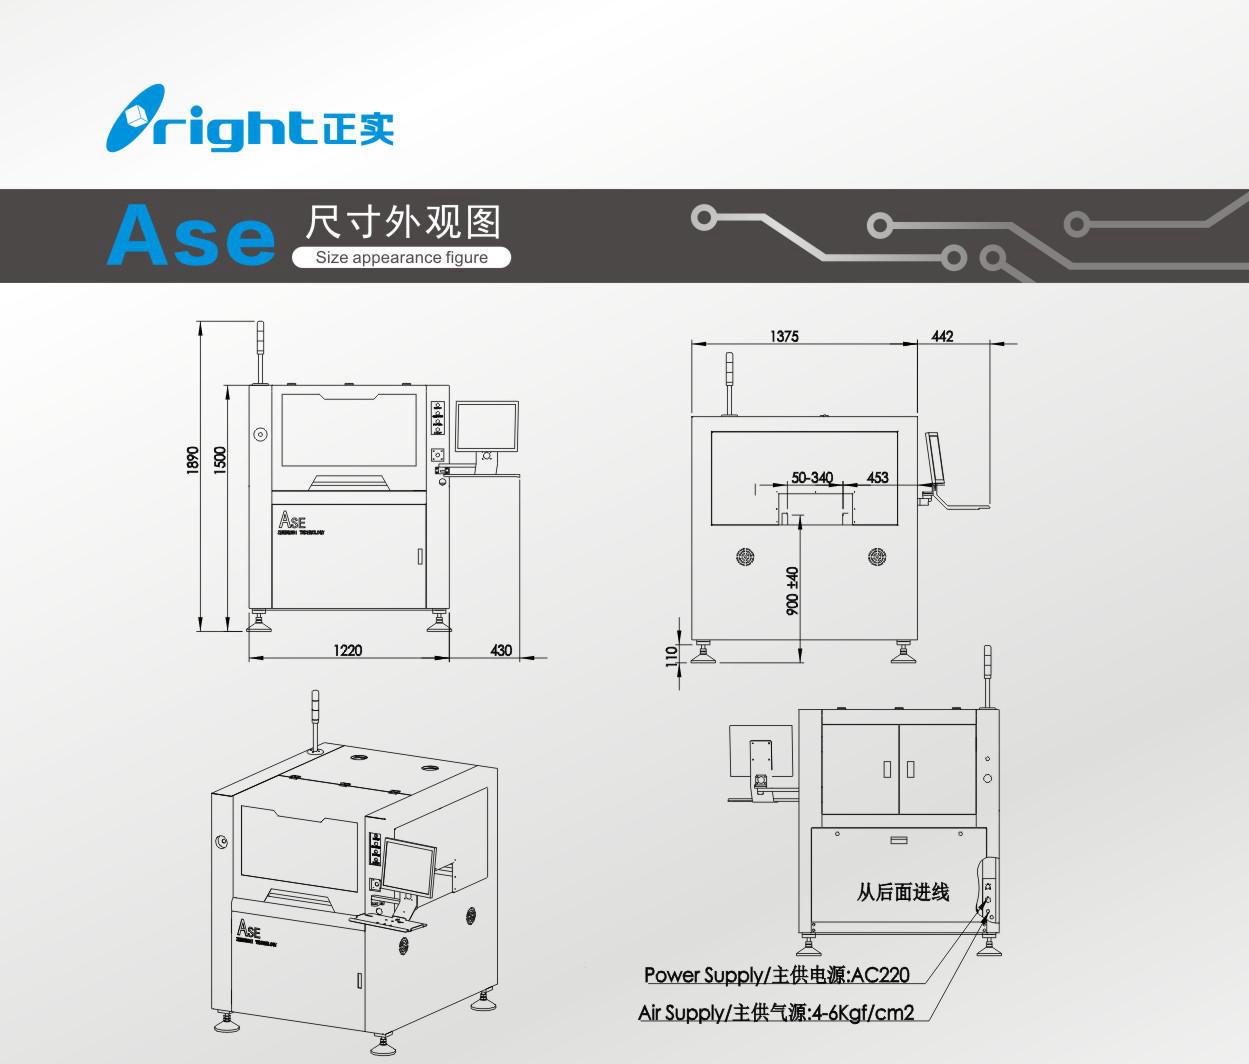 (Ase) 机器尺寸.jpg